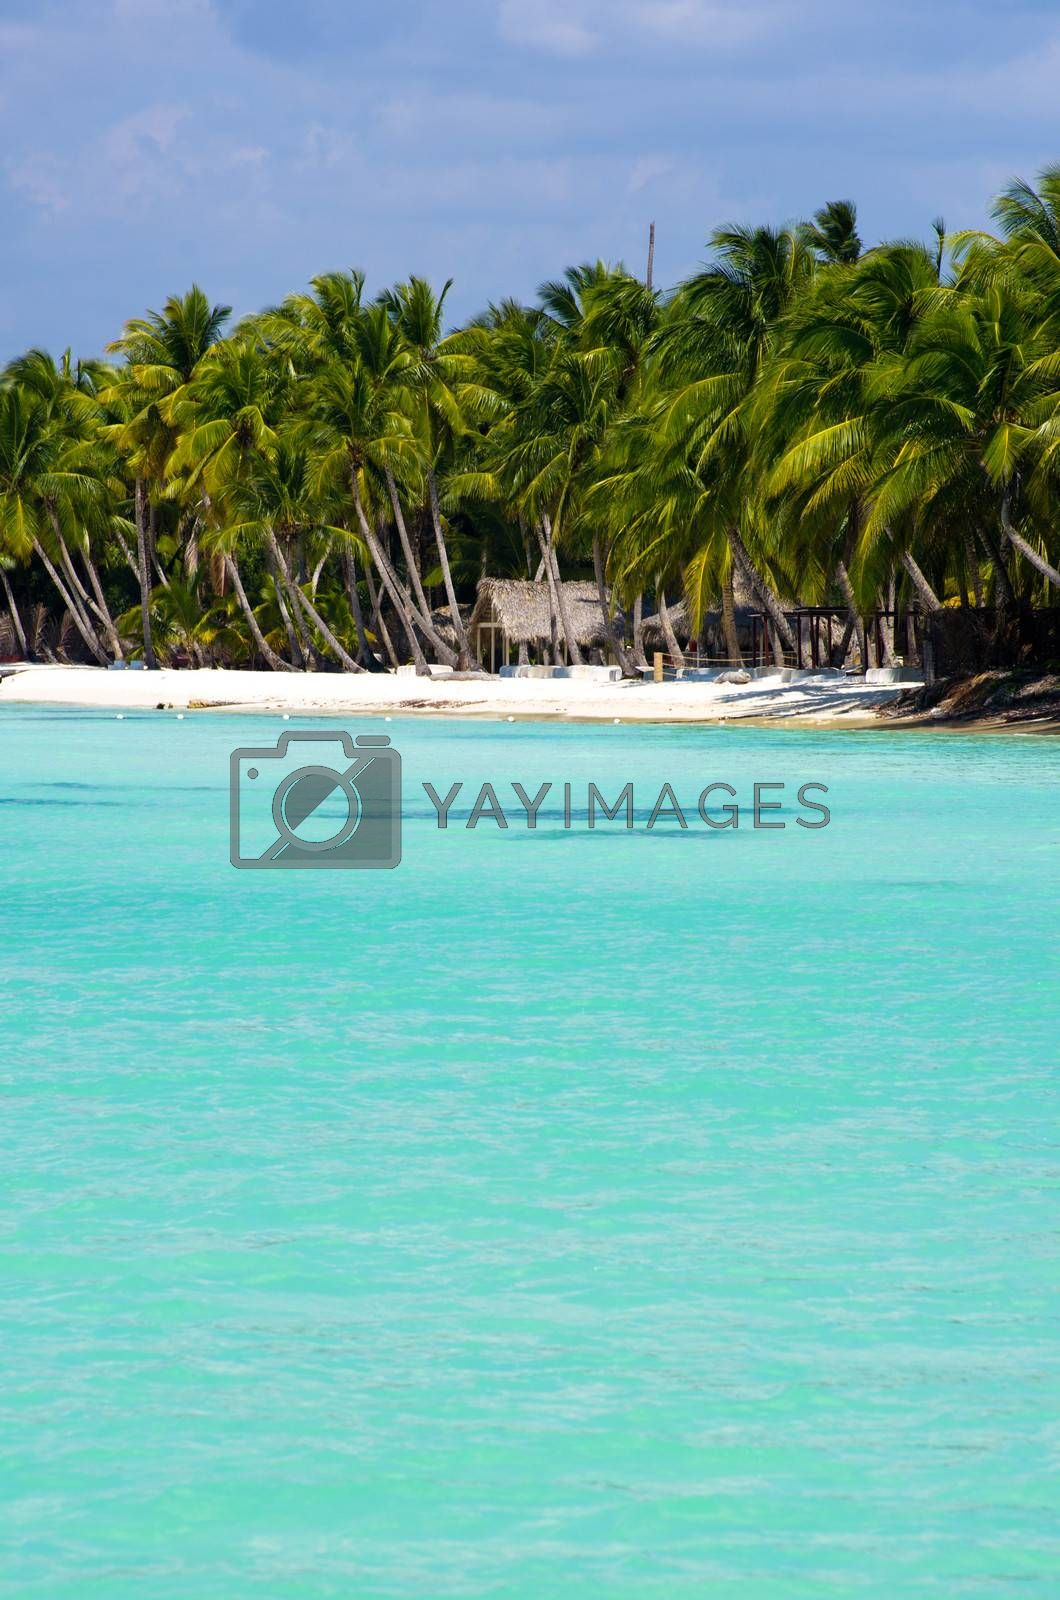 Royalty free image of tropical sea by Pakhnyushchyy